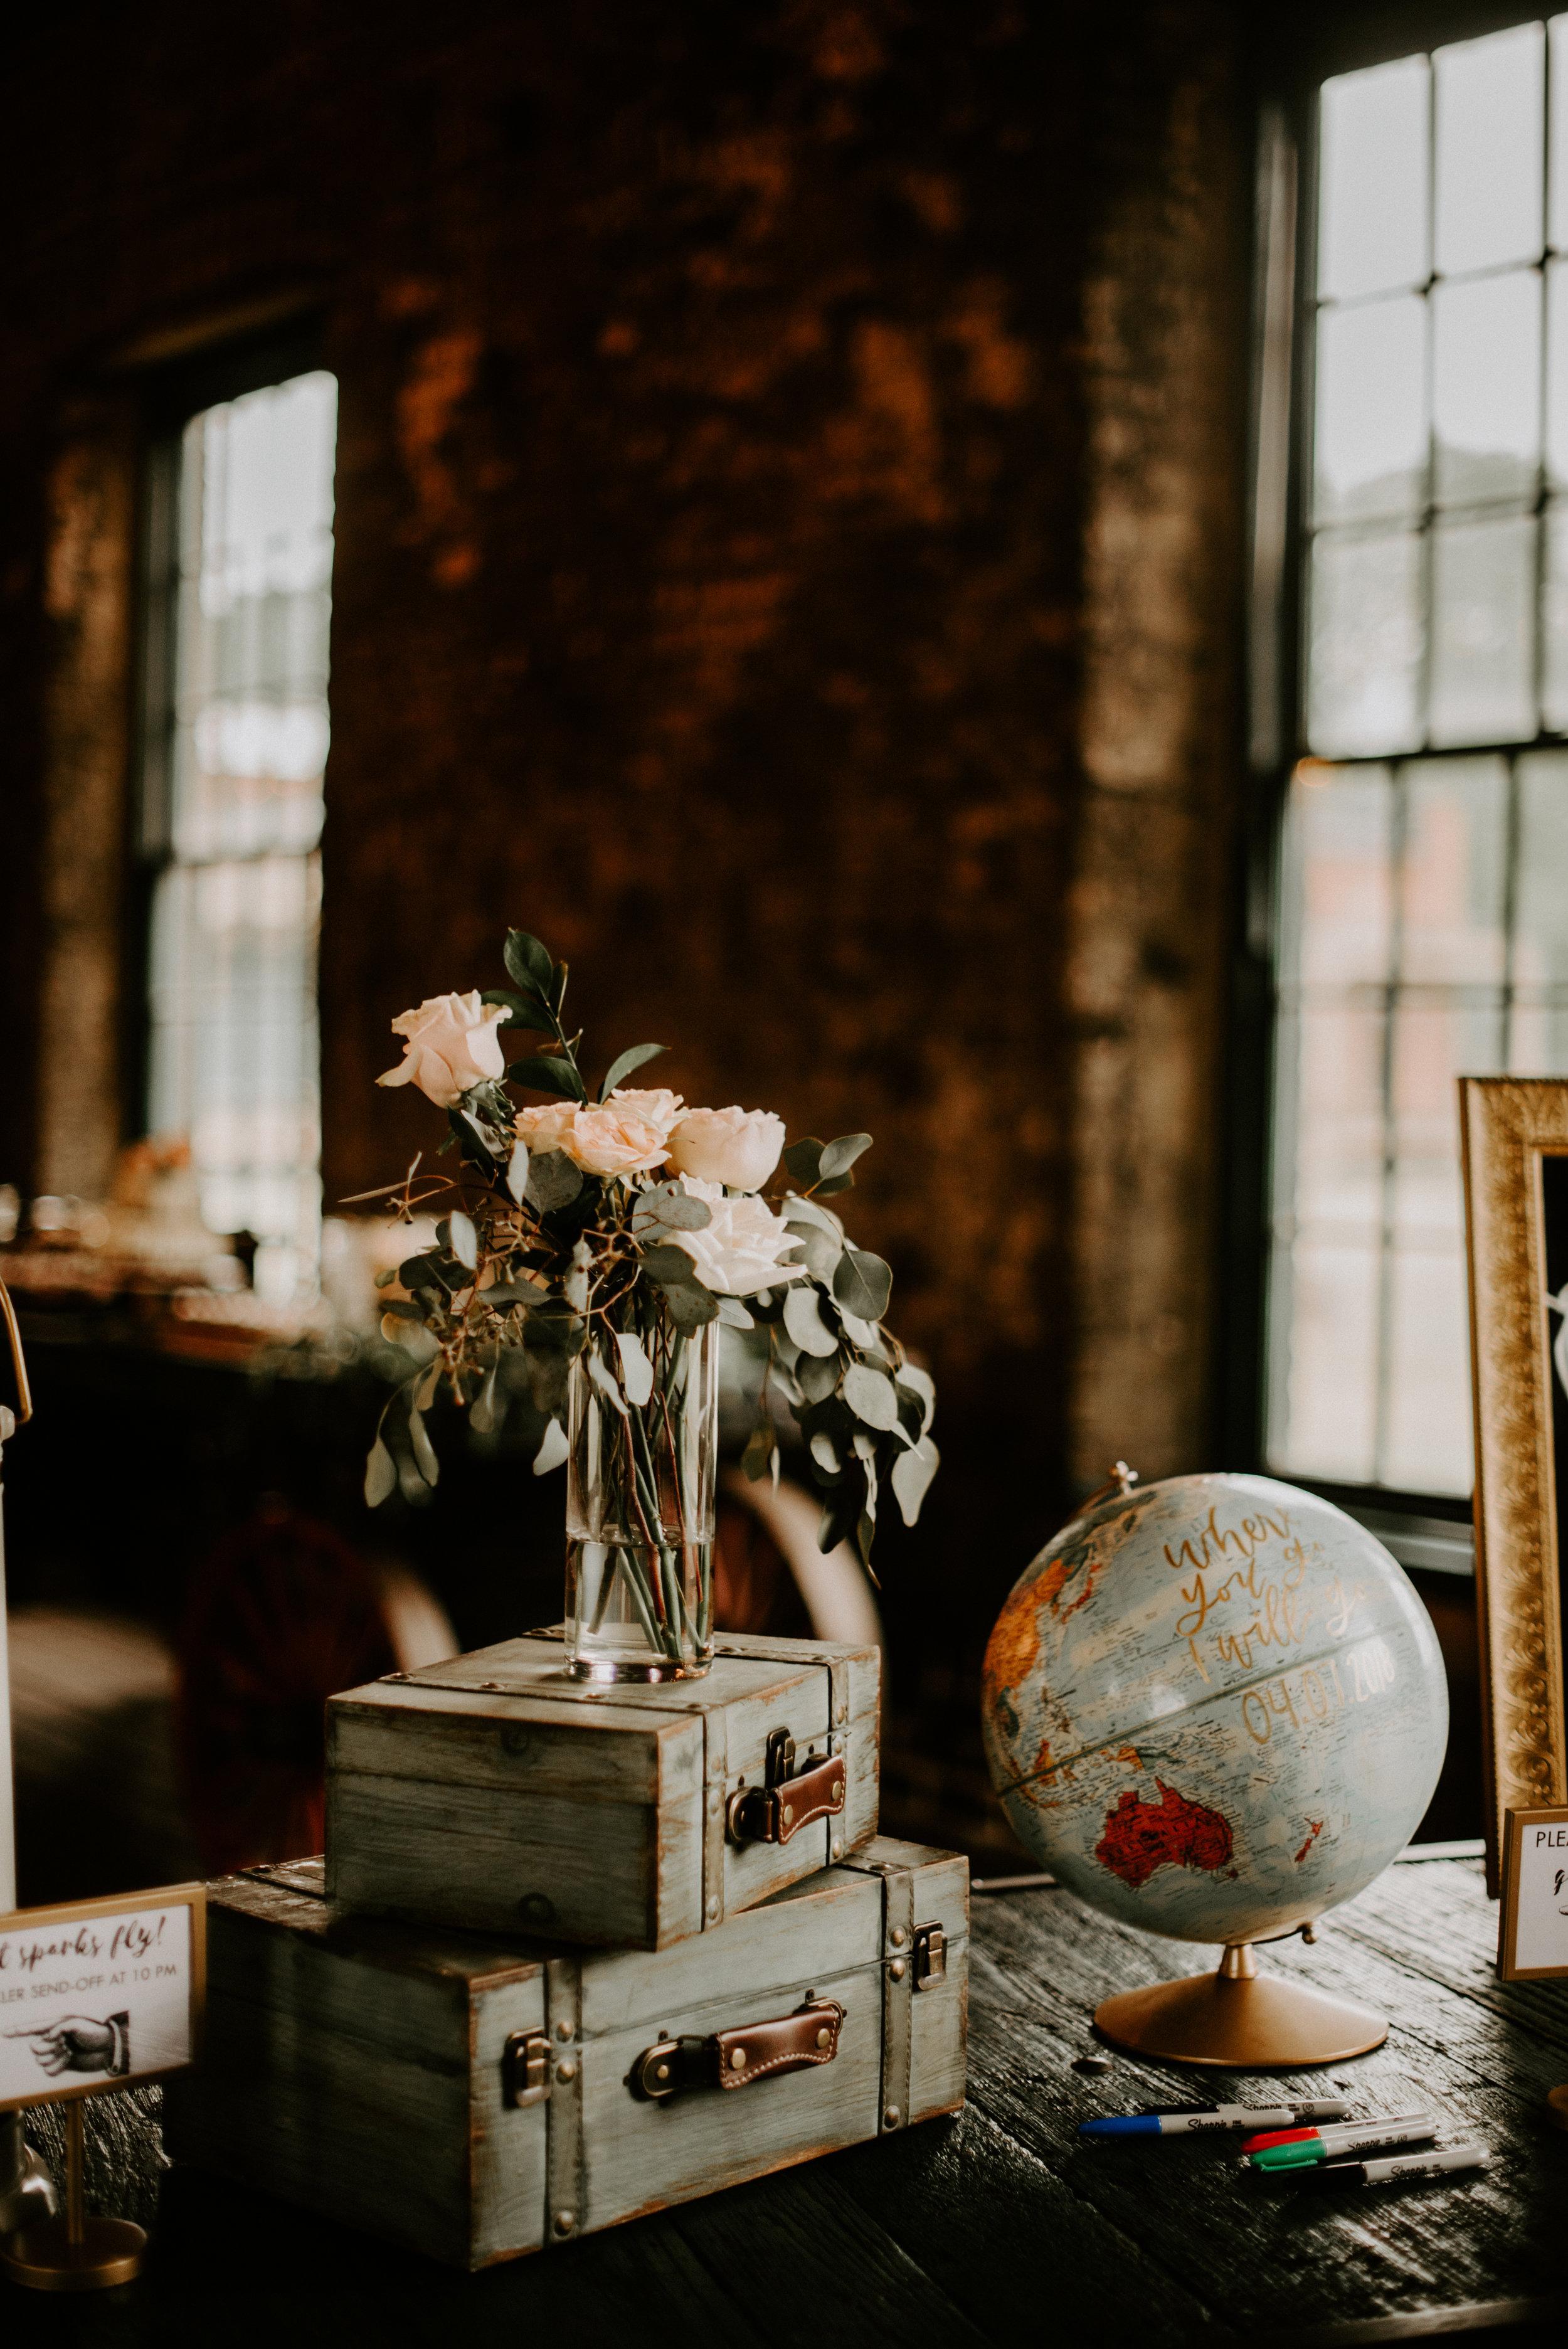 savannah-bridal-shop-andrea-and-mike-evergold-photography-georgia-state-railroad-museum-wedding-savannah-wedding-florist-savannah-wedding-planner-27.jpg